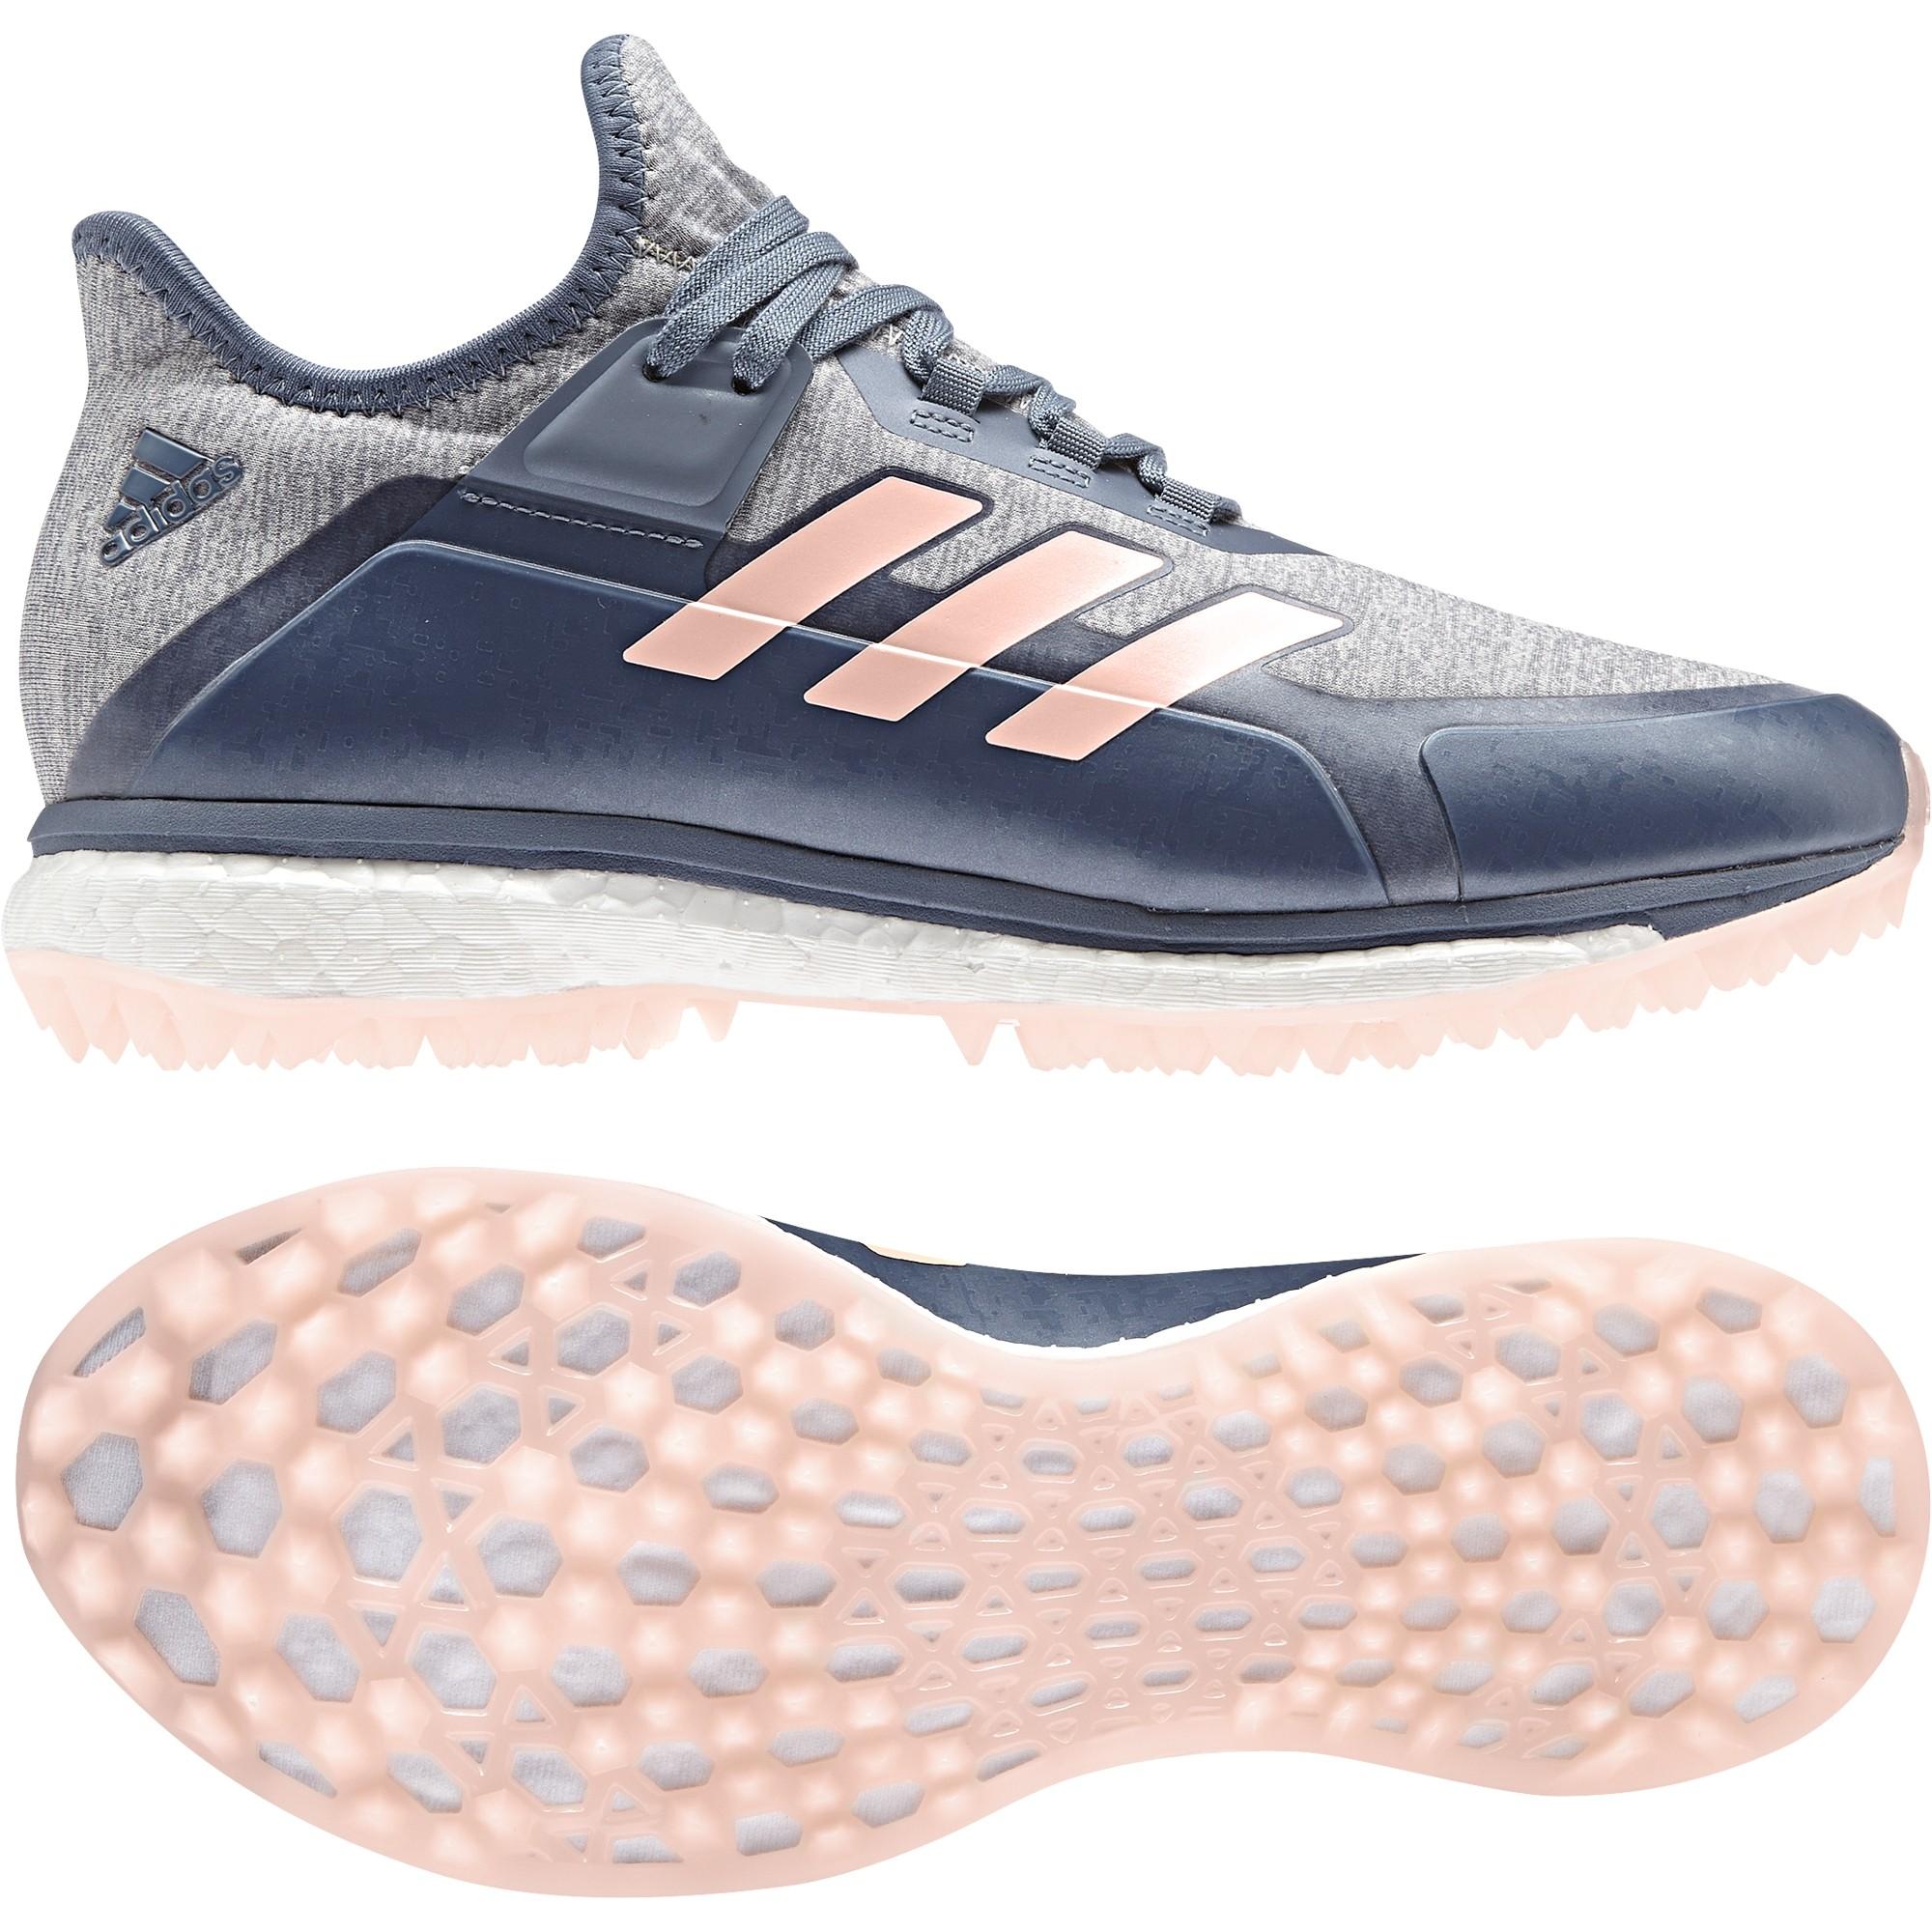 quality design bec5d 43fb1 Adidas 2018 Fabela X Grey Ladies Hockey Shoes